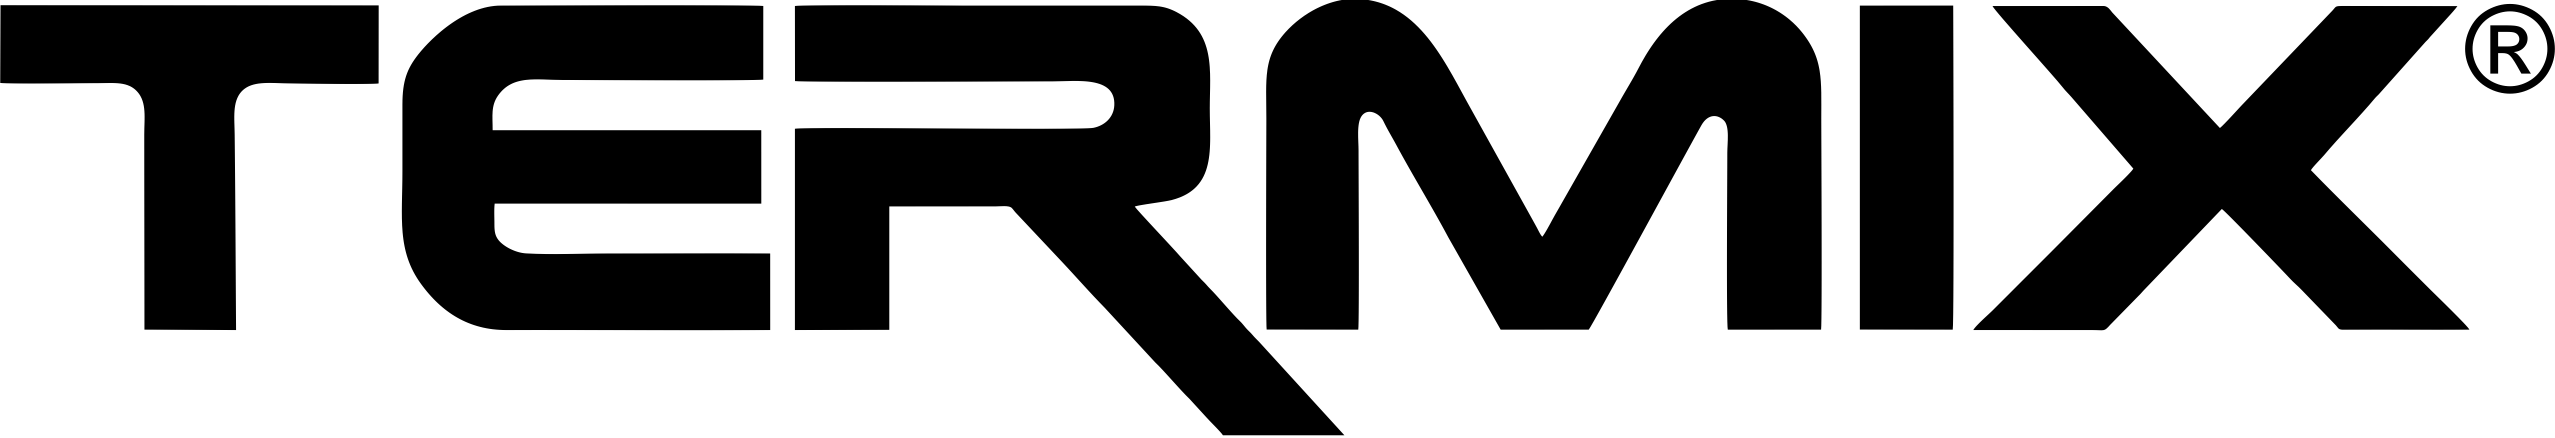 logo Termix